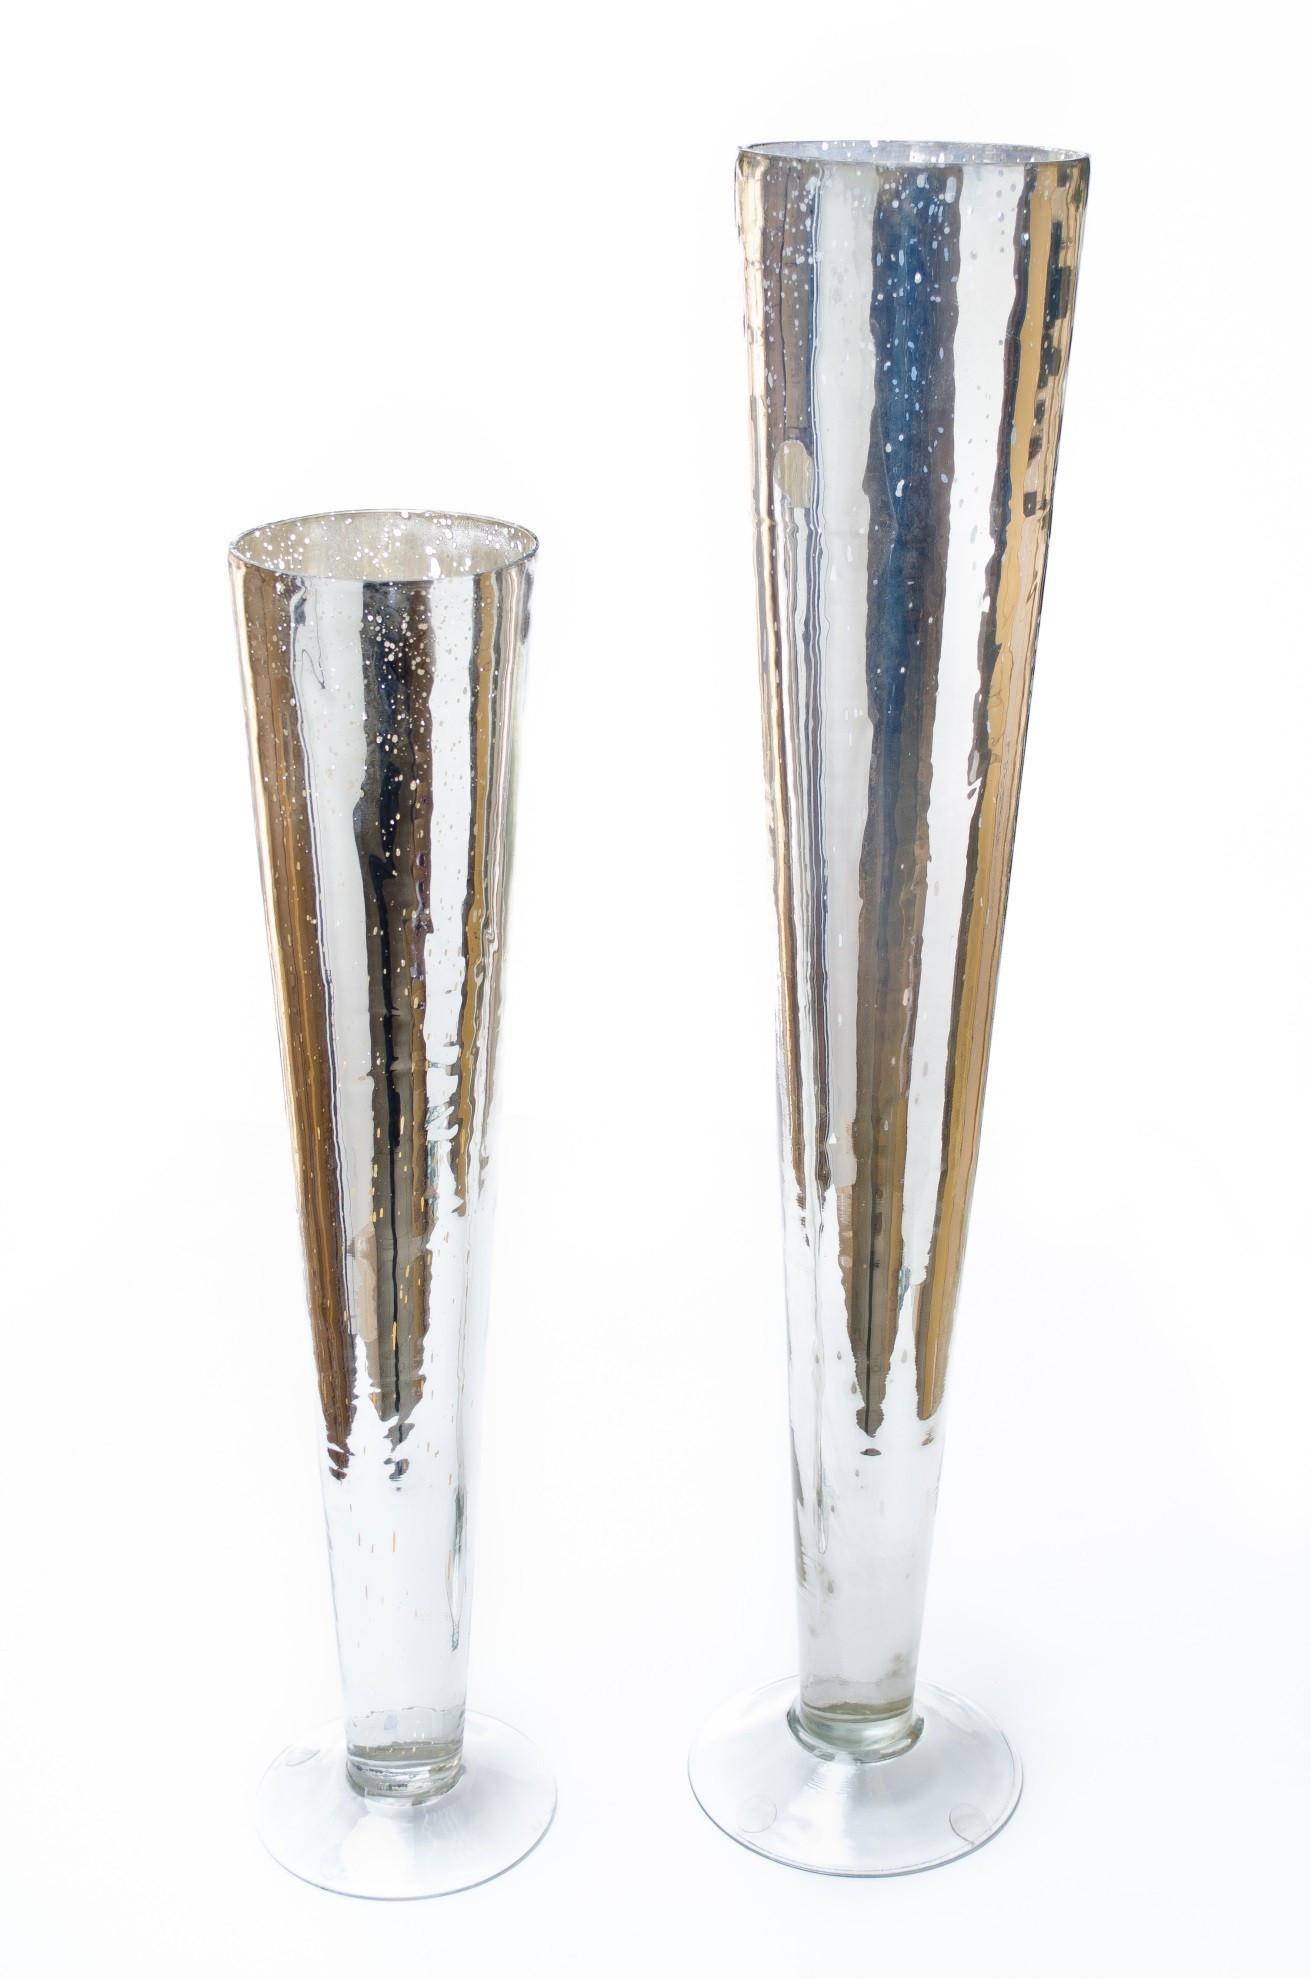 20 Inch Tall Glass Vases Of Silver Vases wholesale Pandoraocharms Us Regarding Silver Vases wholesale Gold Mercury Glass Vase Large